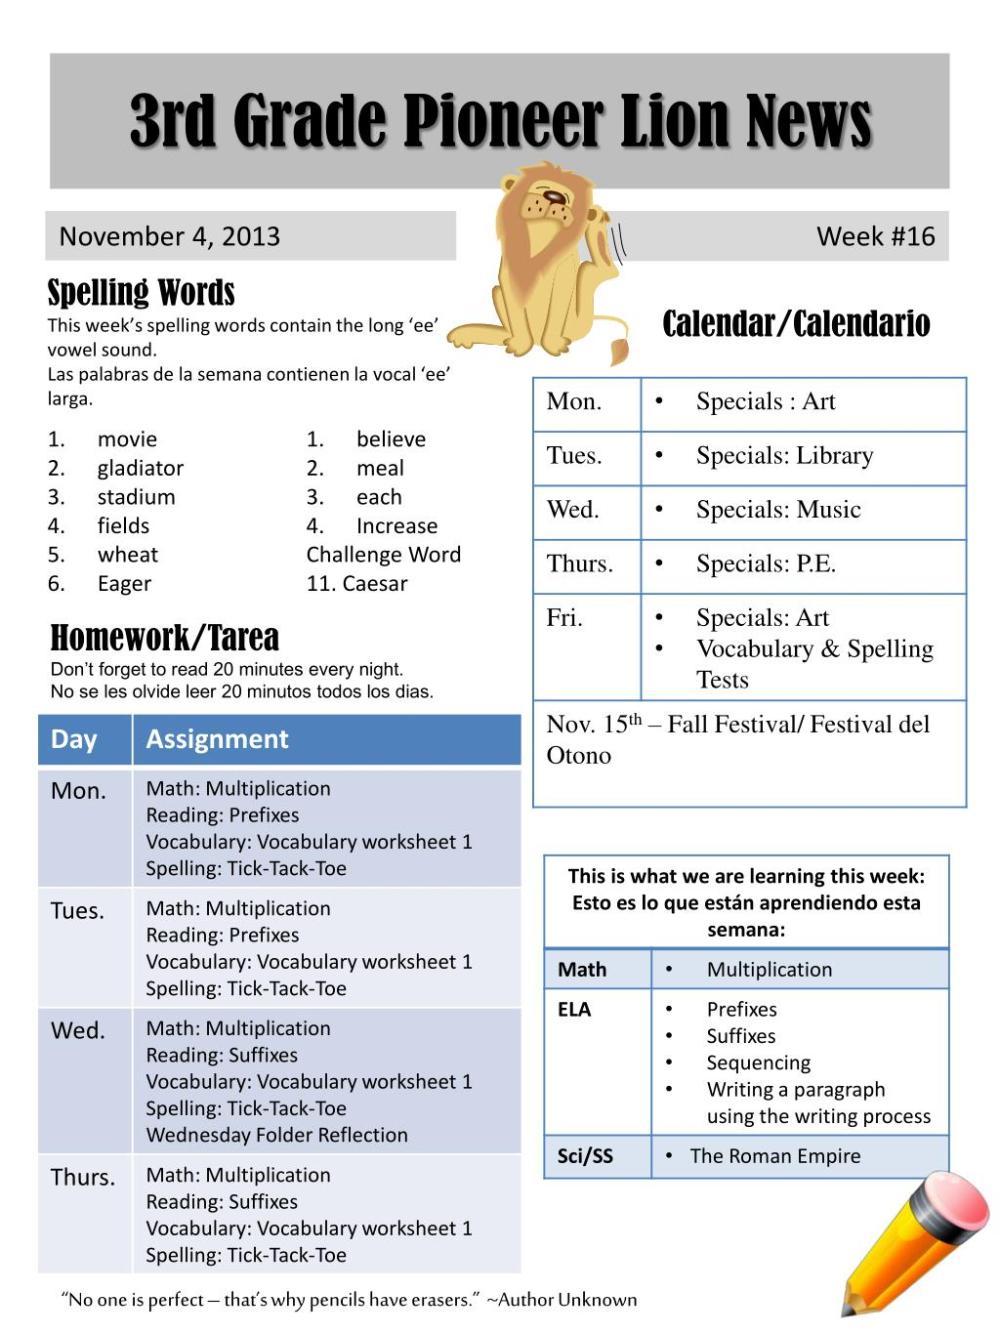 medium resolution of PPT - 3rd Grade Pioneer Lion News PowerPoint Presentation